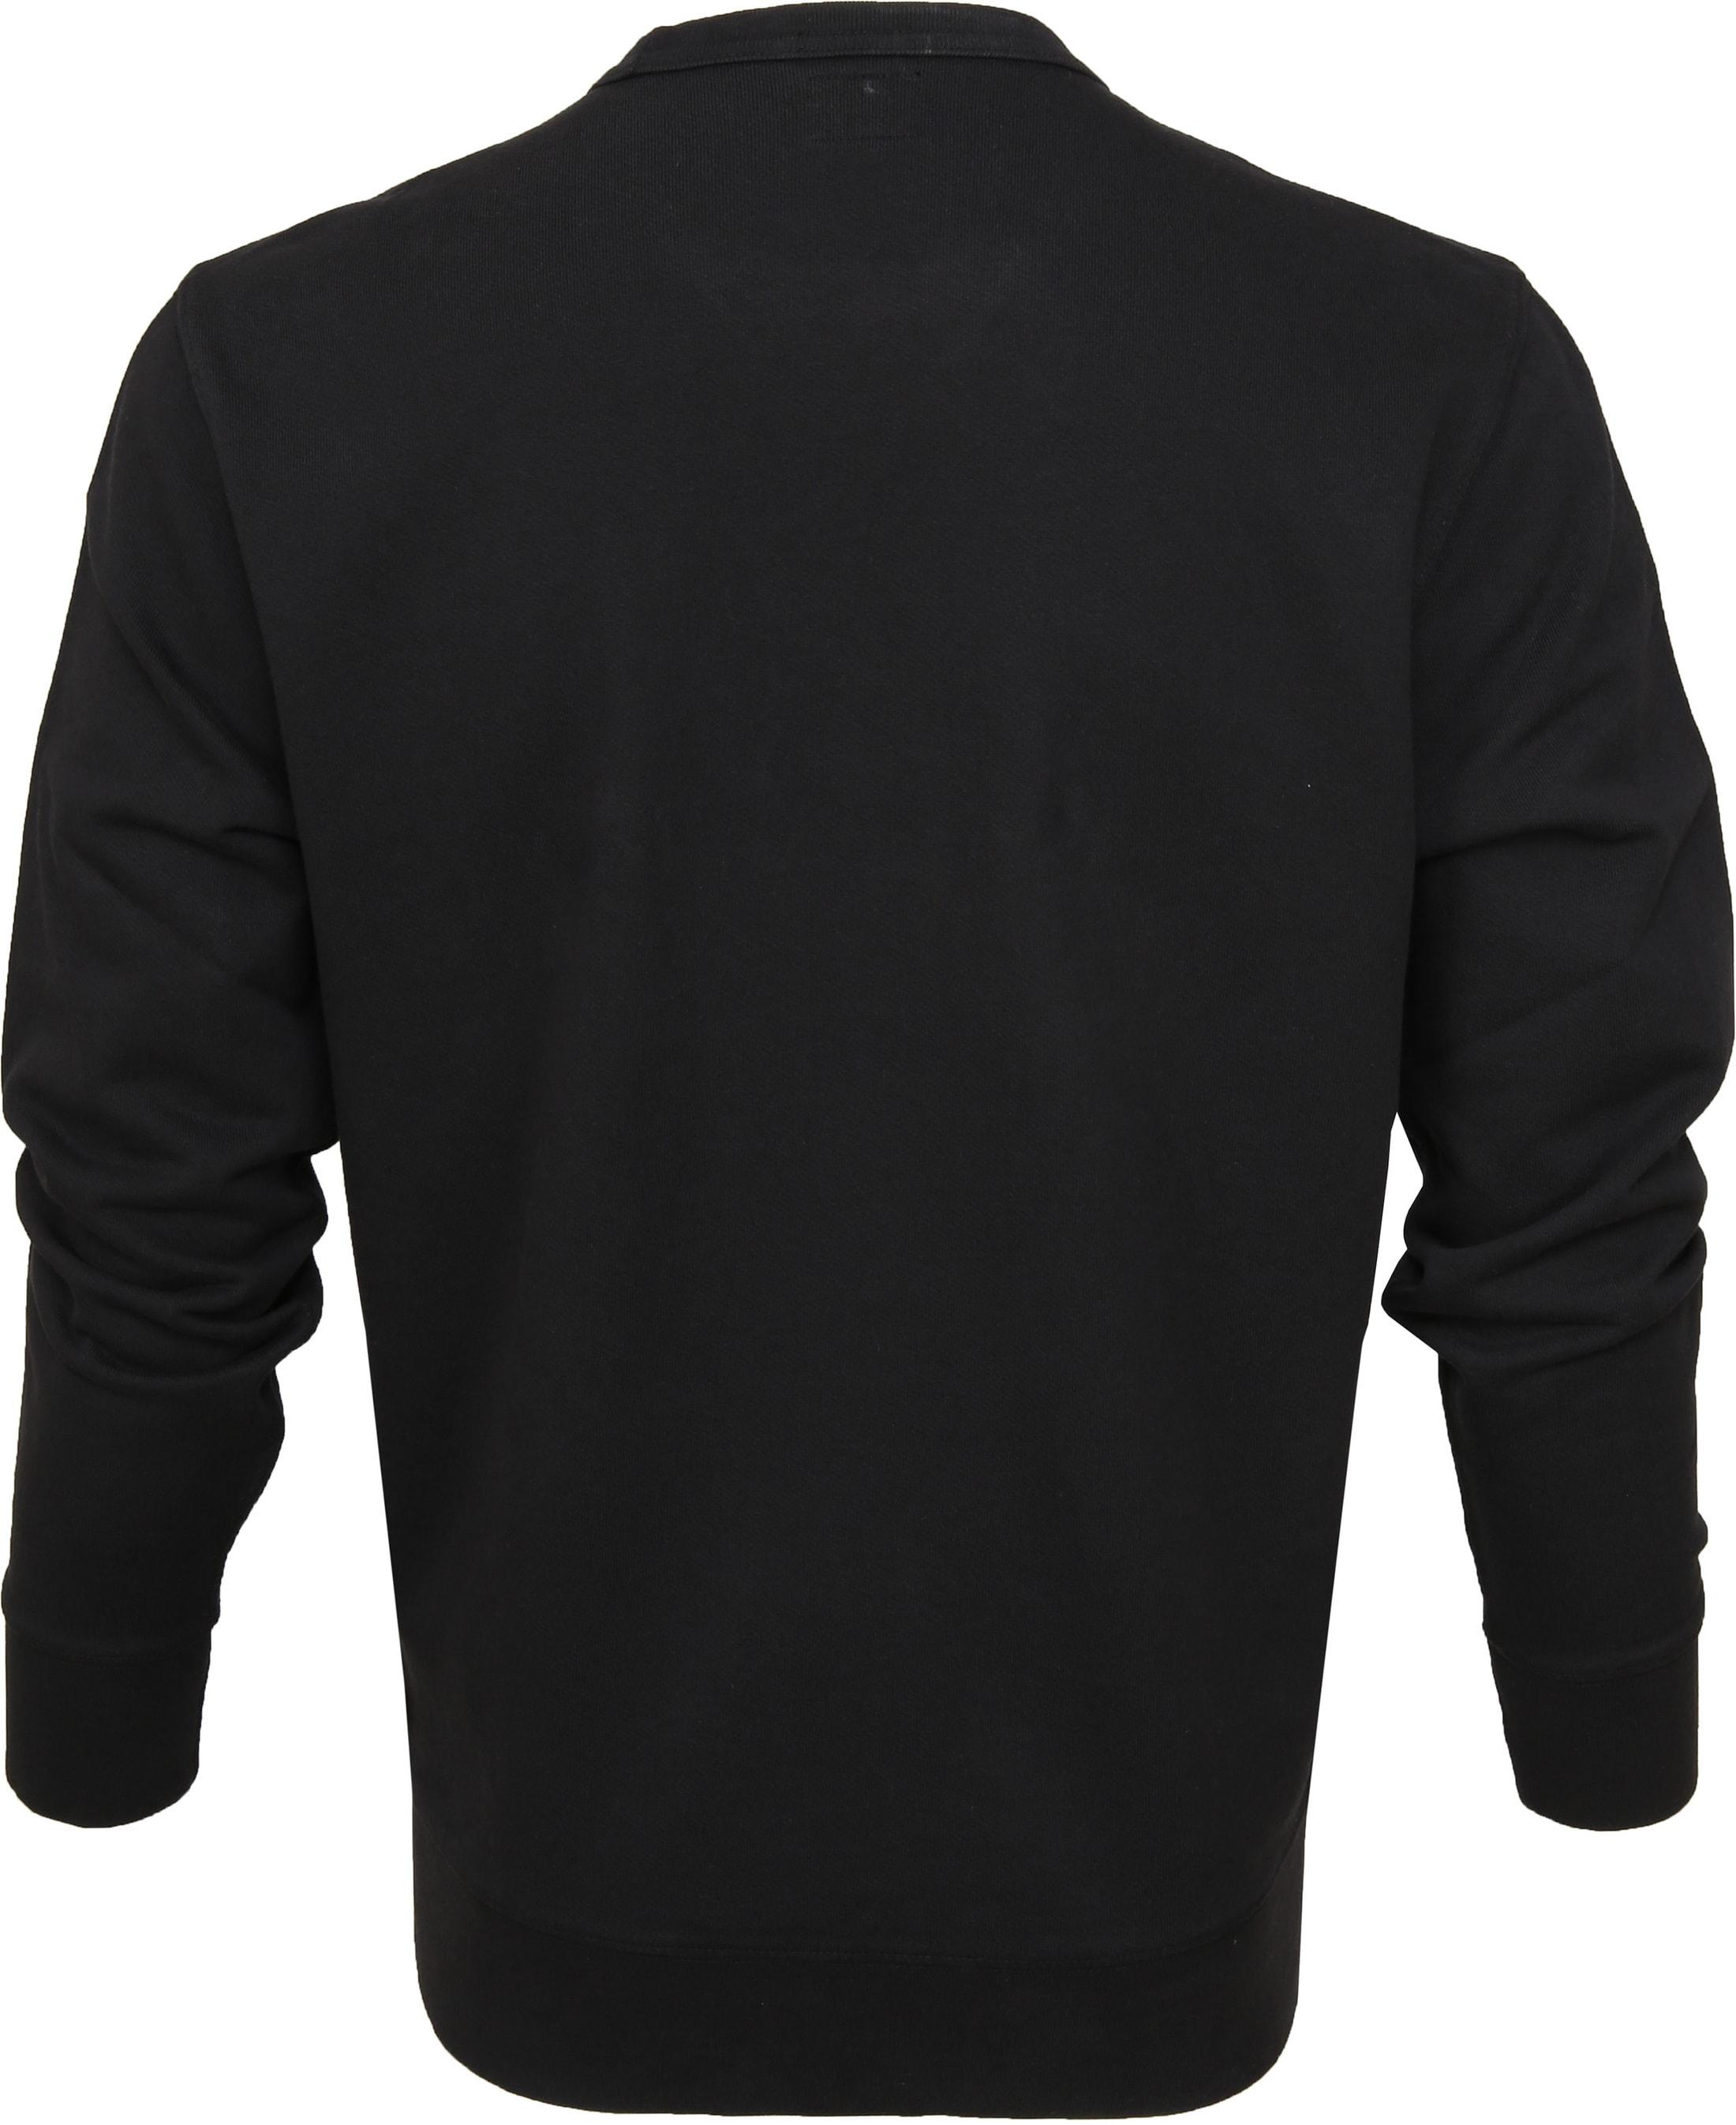 Levi's Graphic Miniral Sweater Zwart foto 2